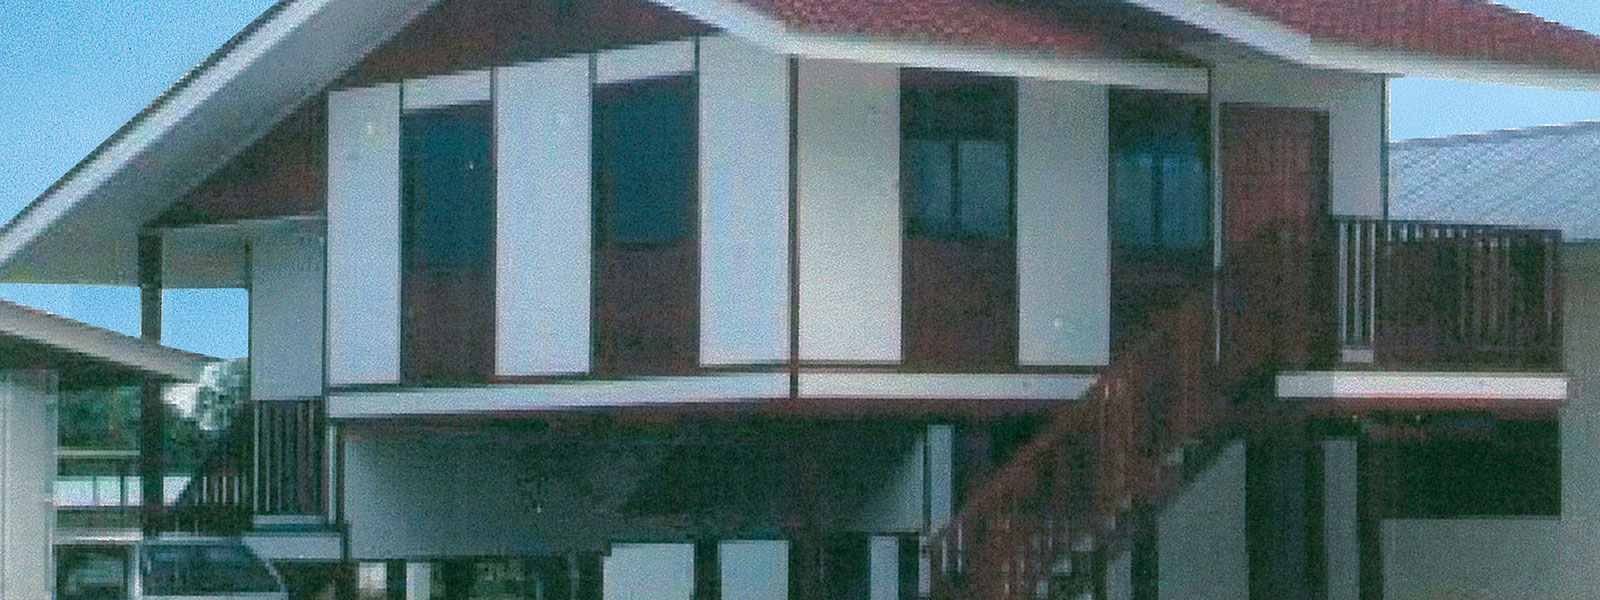 1996)